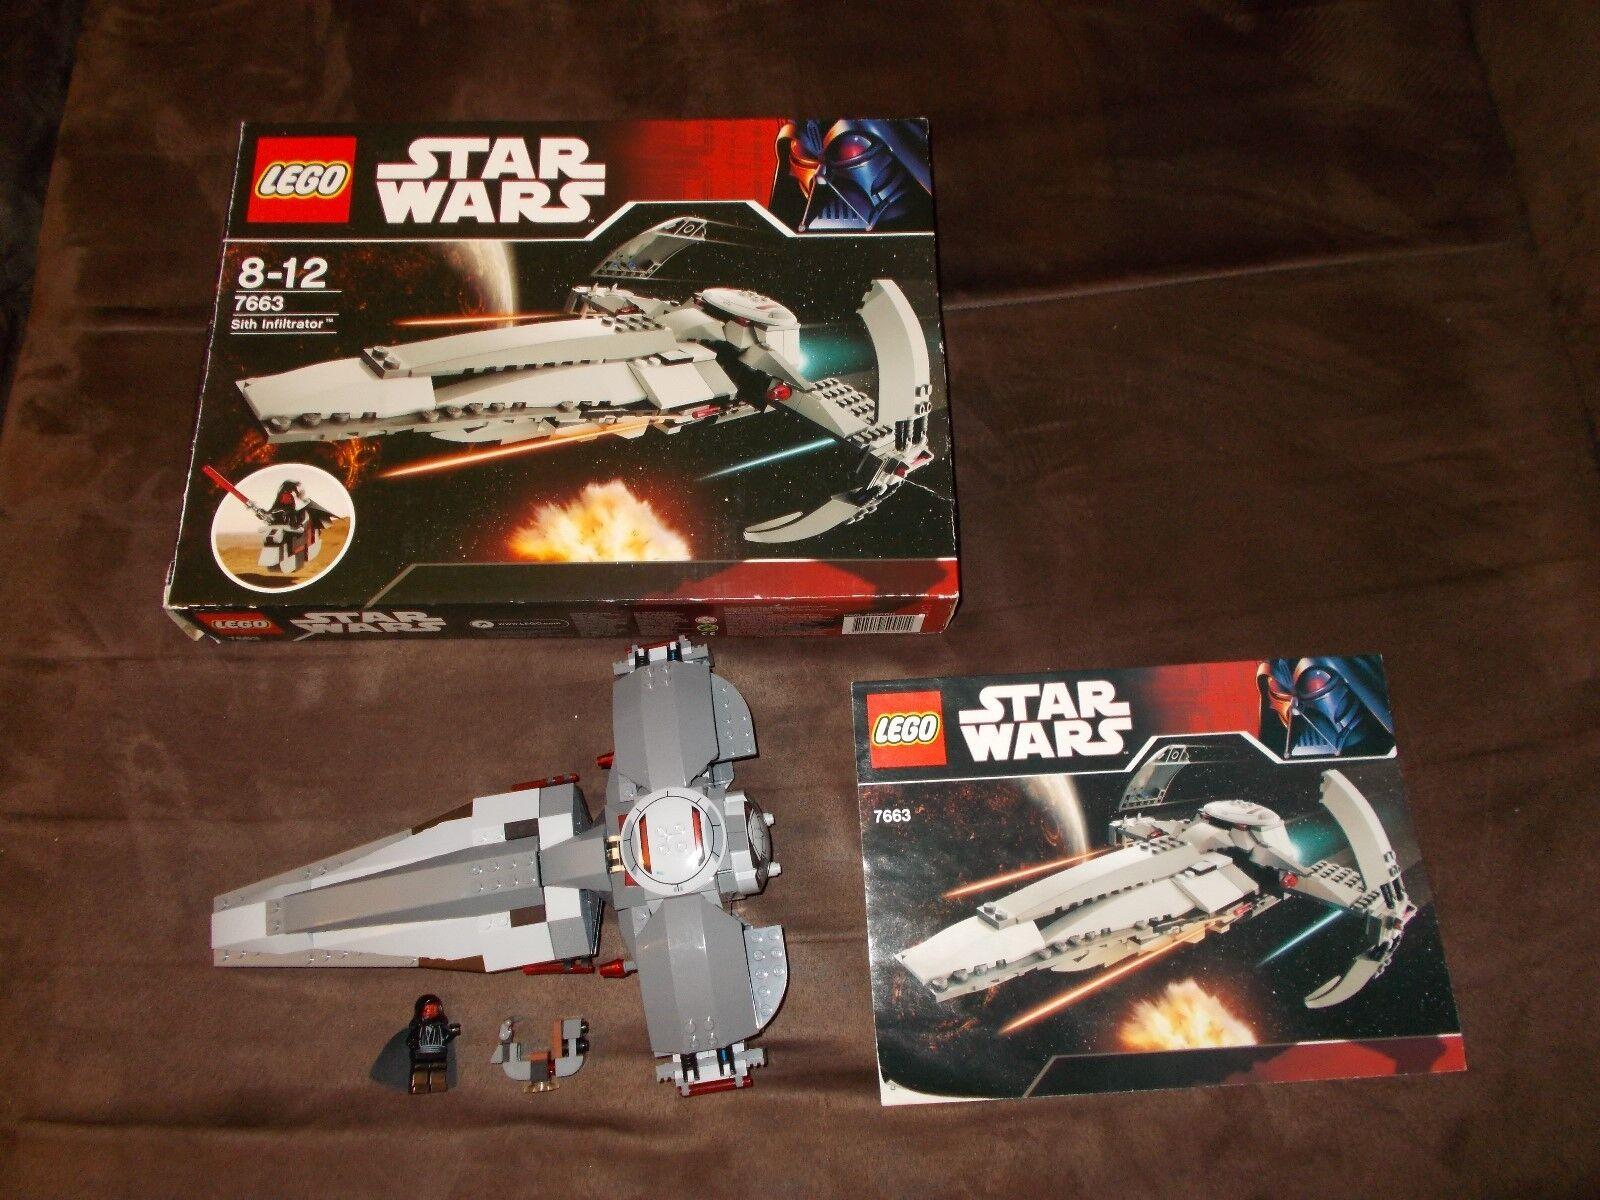 LEGO ® Star Wars - 7663-Sith 7663-Sith 7663-Sith Infiltrator-avec ba ET Neuf dans sa boîte a3722c